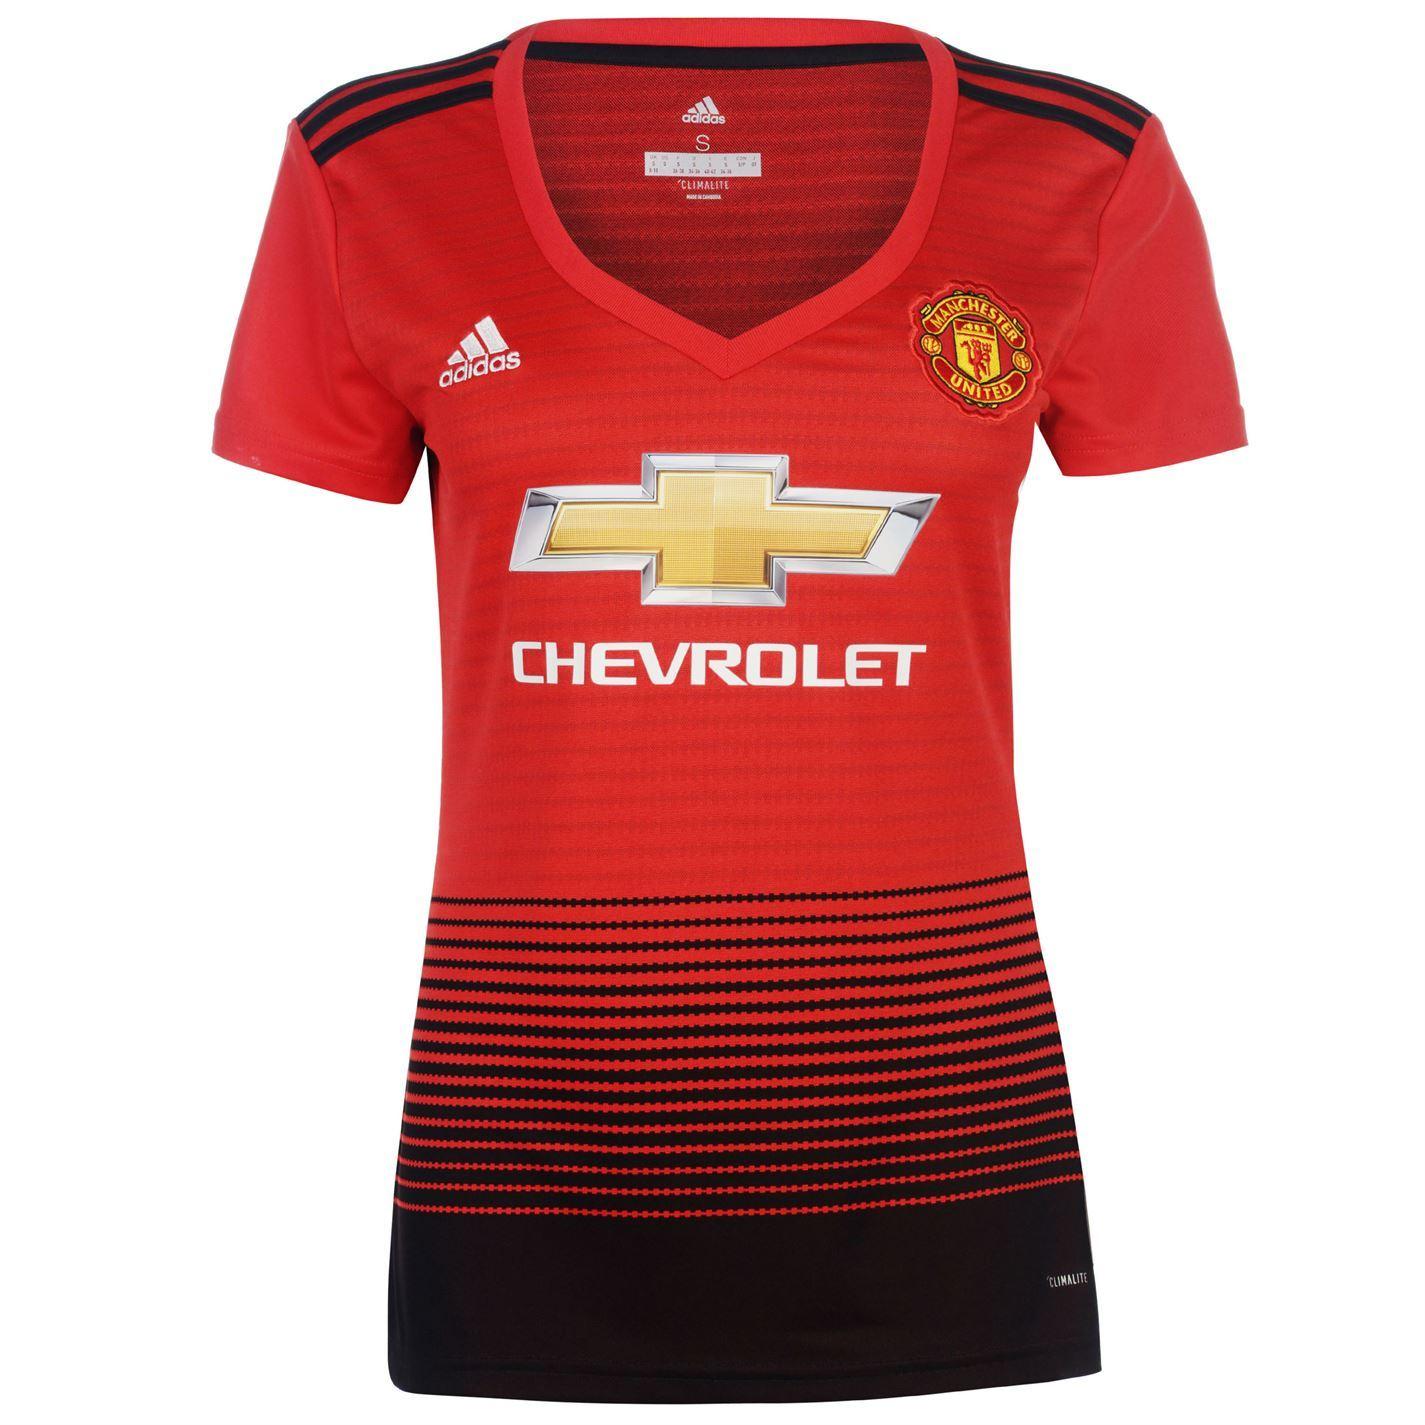 f8e04a15226 adidas Manchester United Home Jersey 2018-19 Womens Red Football Soccer  Shirt